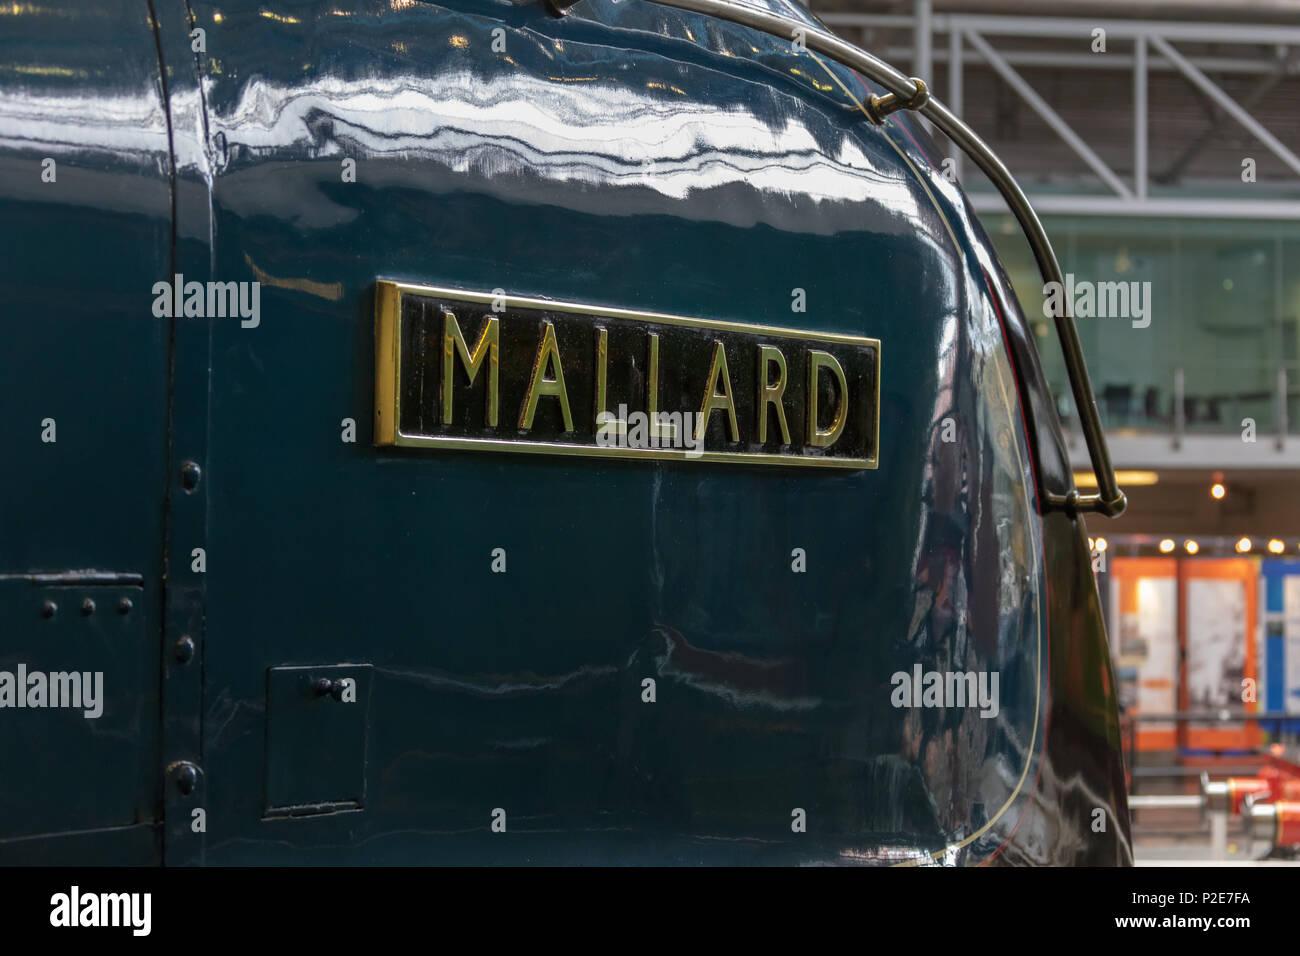 Mallard Train York - Stock Image